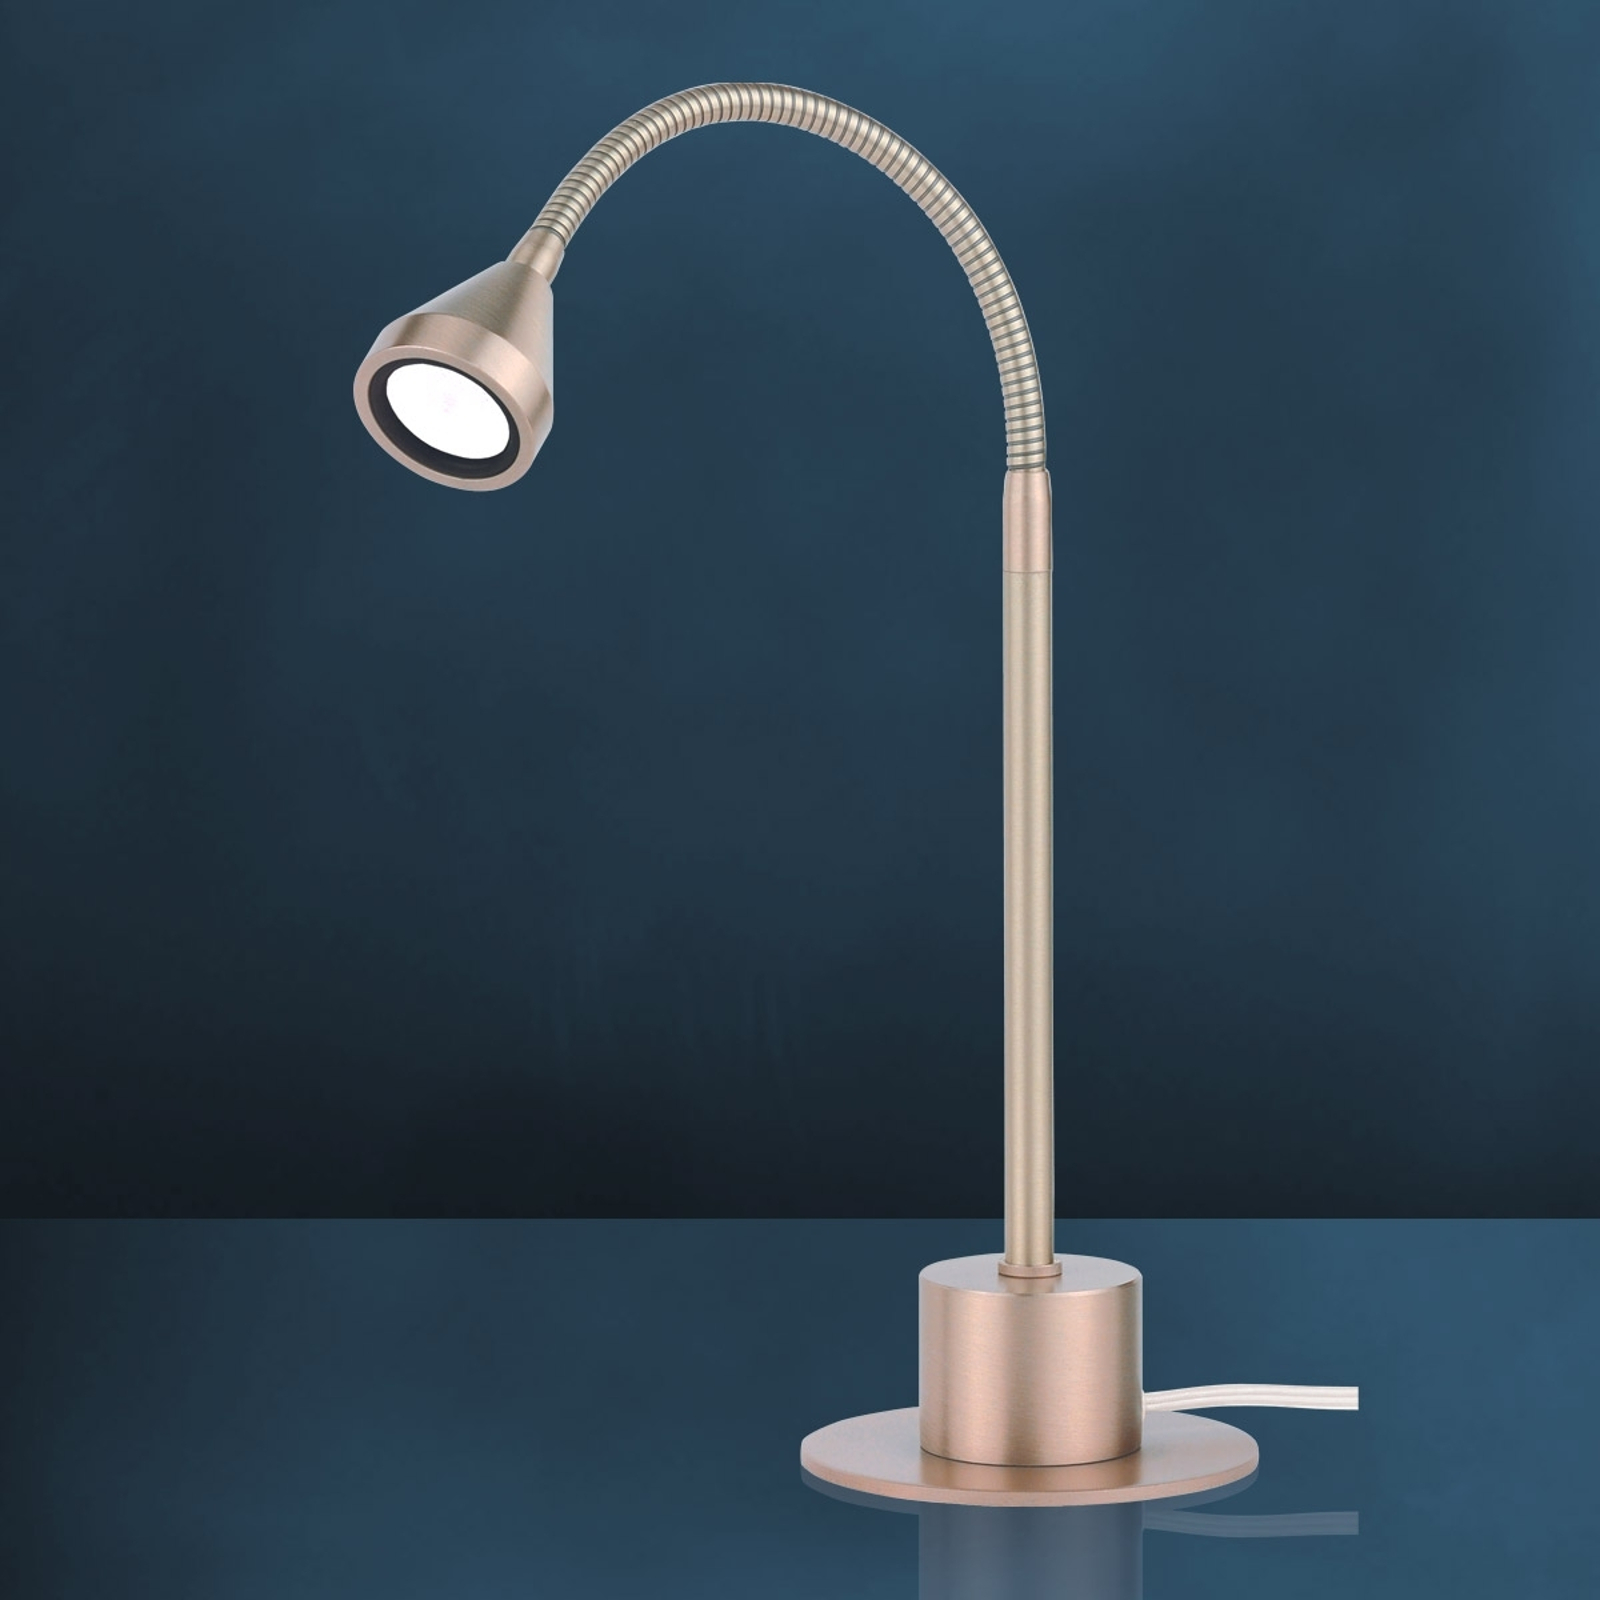 LED-tafellamp MINI flexibel universeelwitte arm